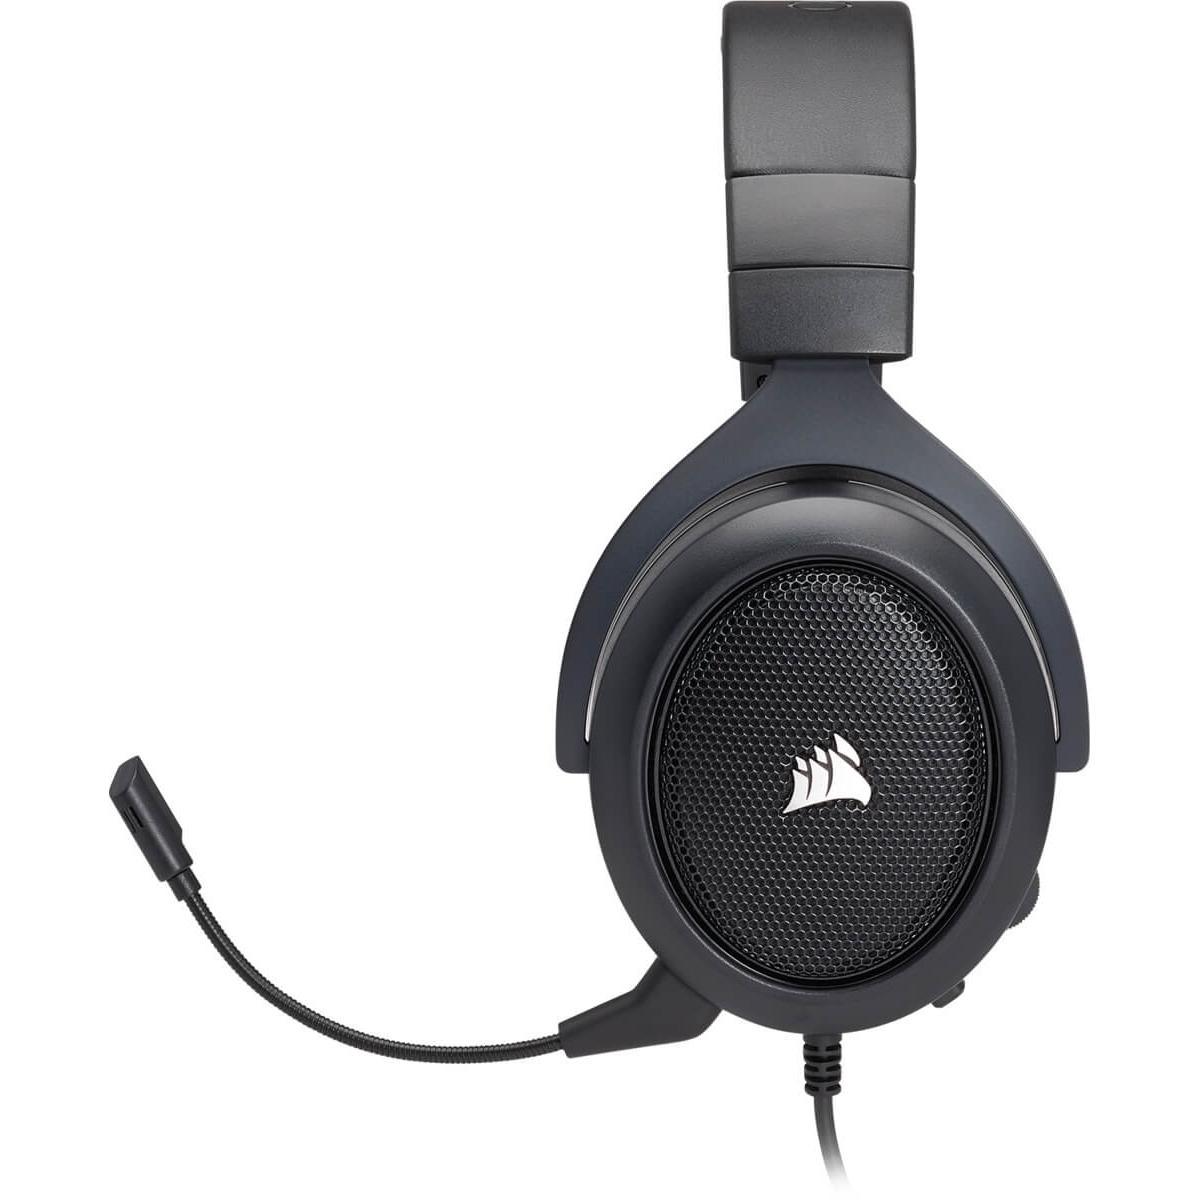 Headset Gamer Corsair HS60 Carbon 7.1 - CA-9011173-NA